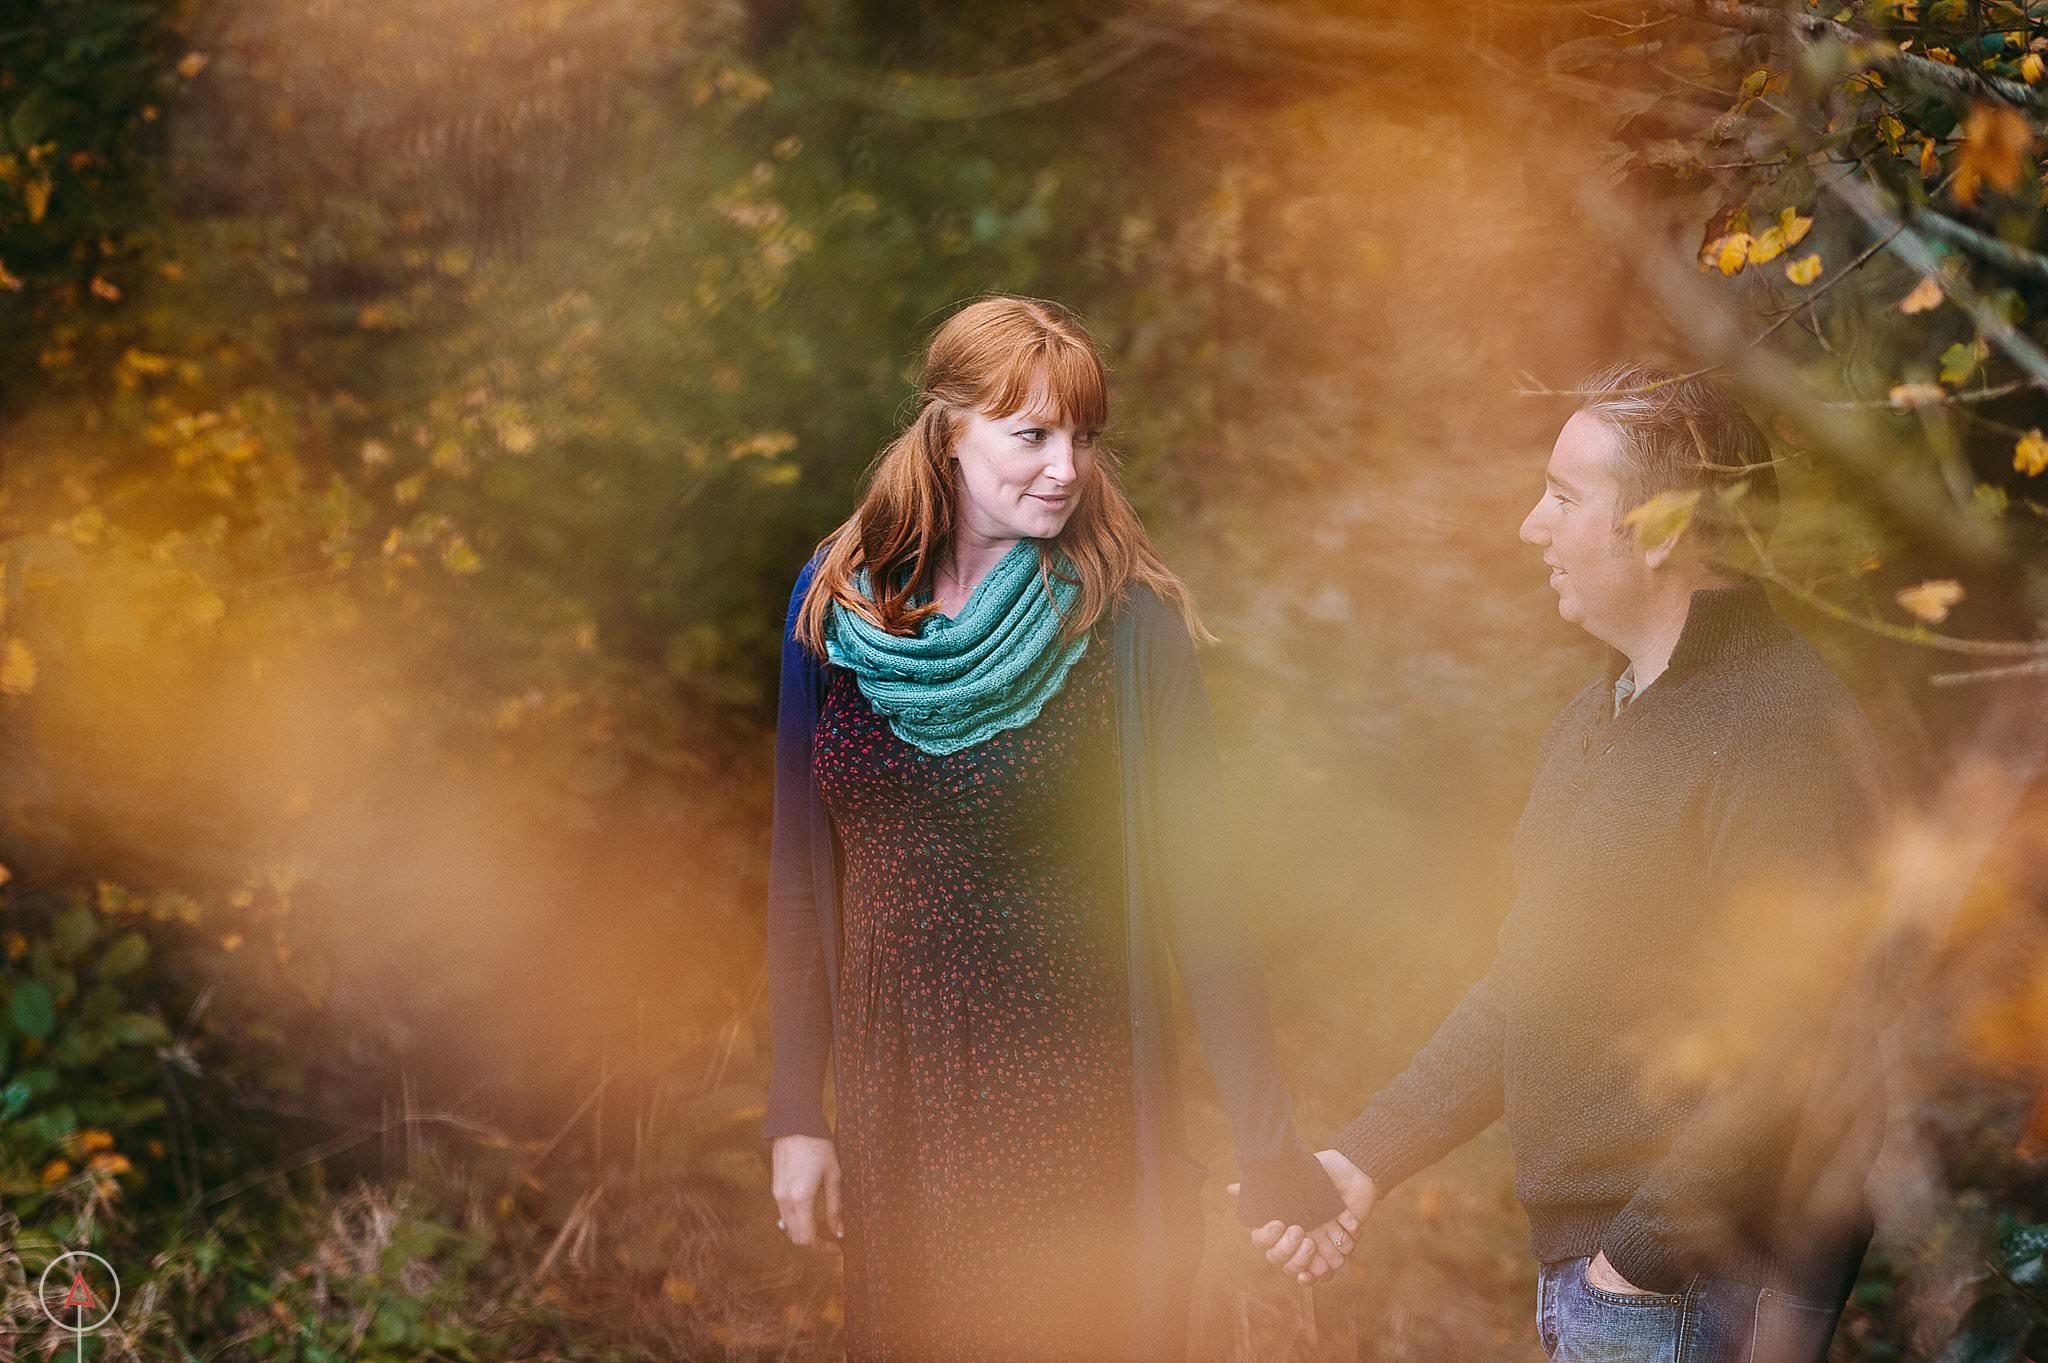 South-Wales-Pre-Wedding-Photography-Aga-Tomaszek-00025